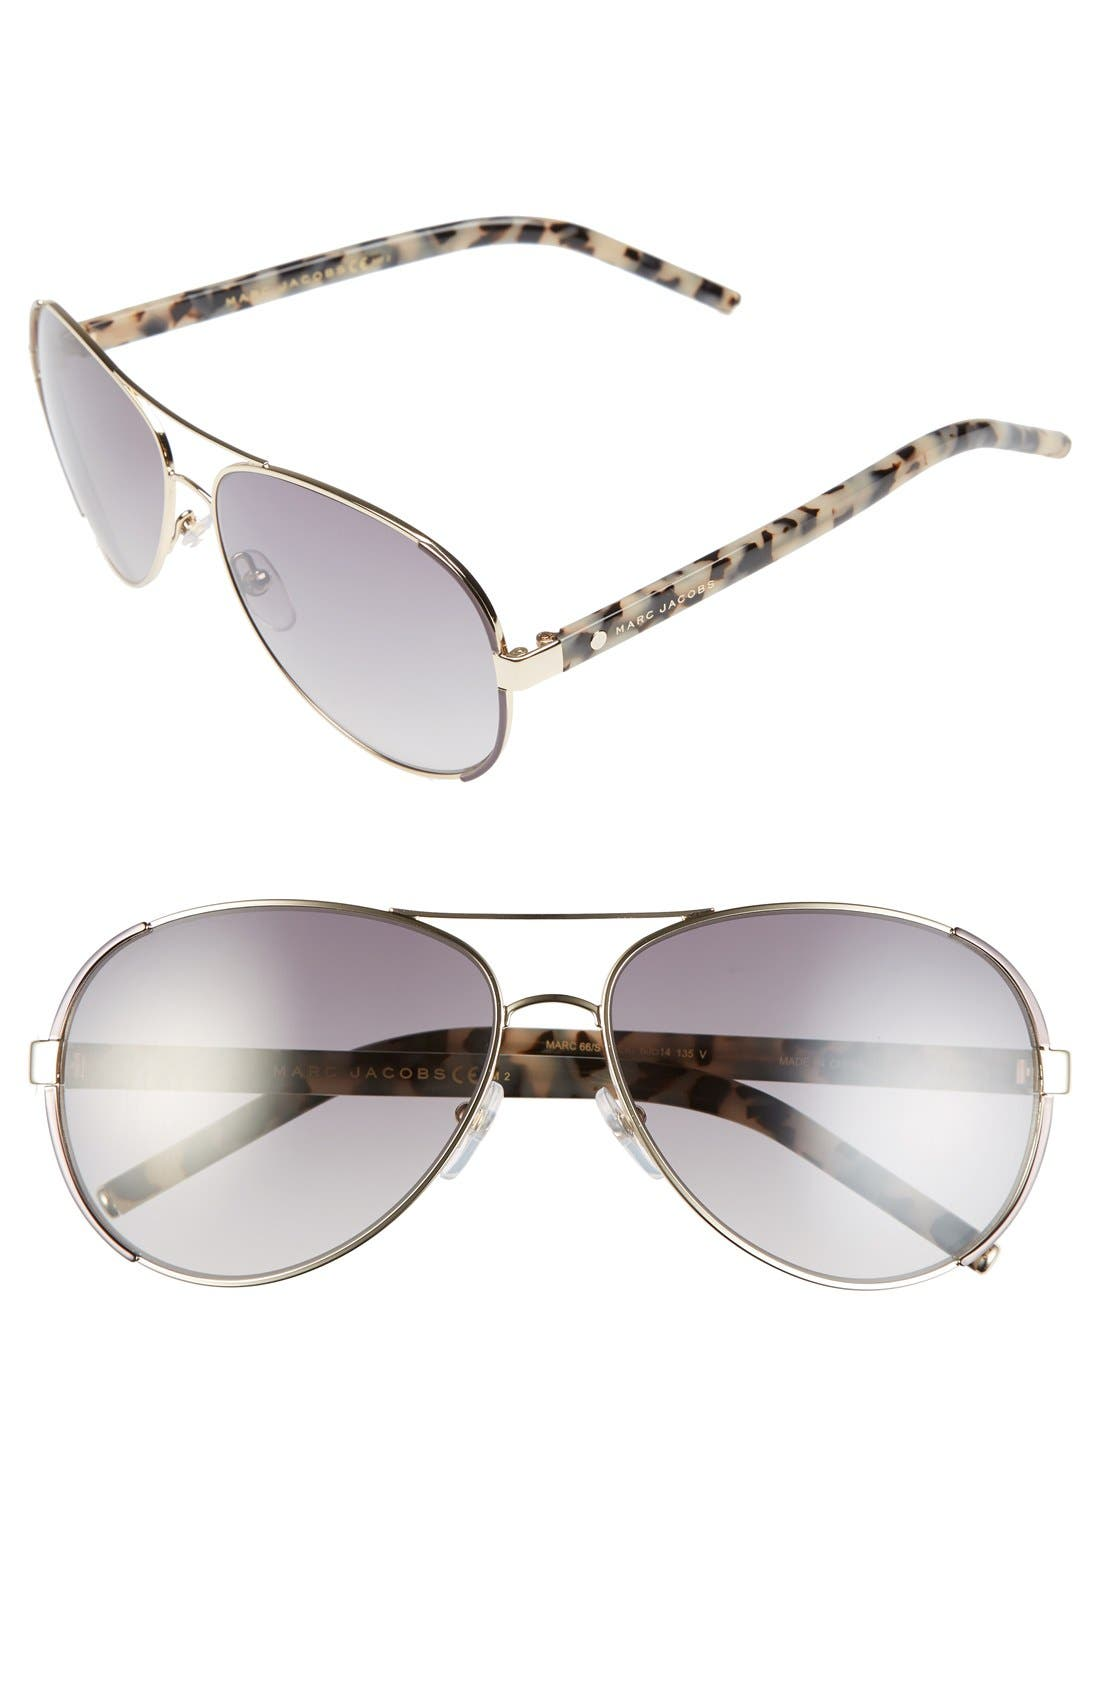 60mm Oversize Aviator Sunglasses,                         Main,                         color, 712